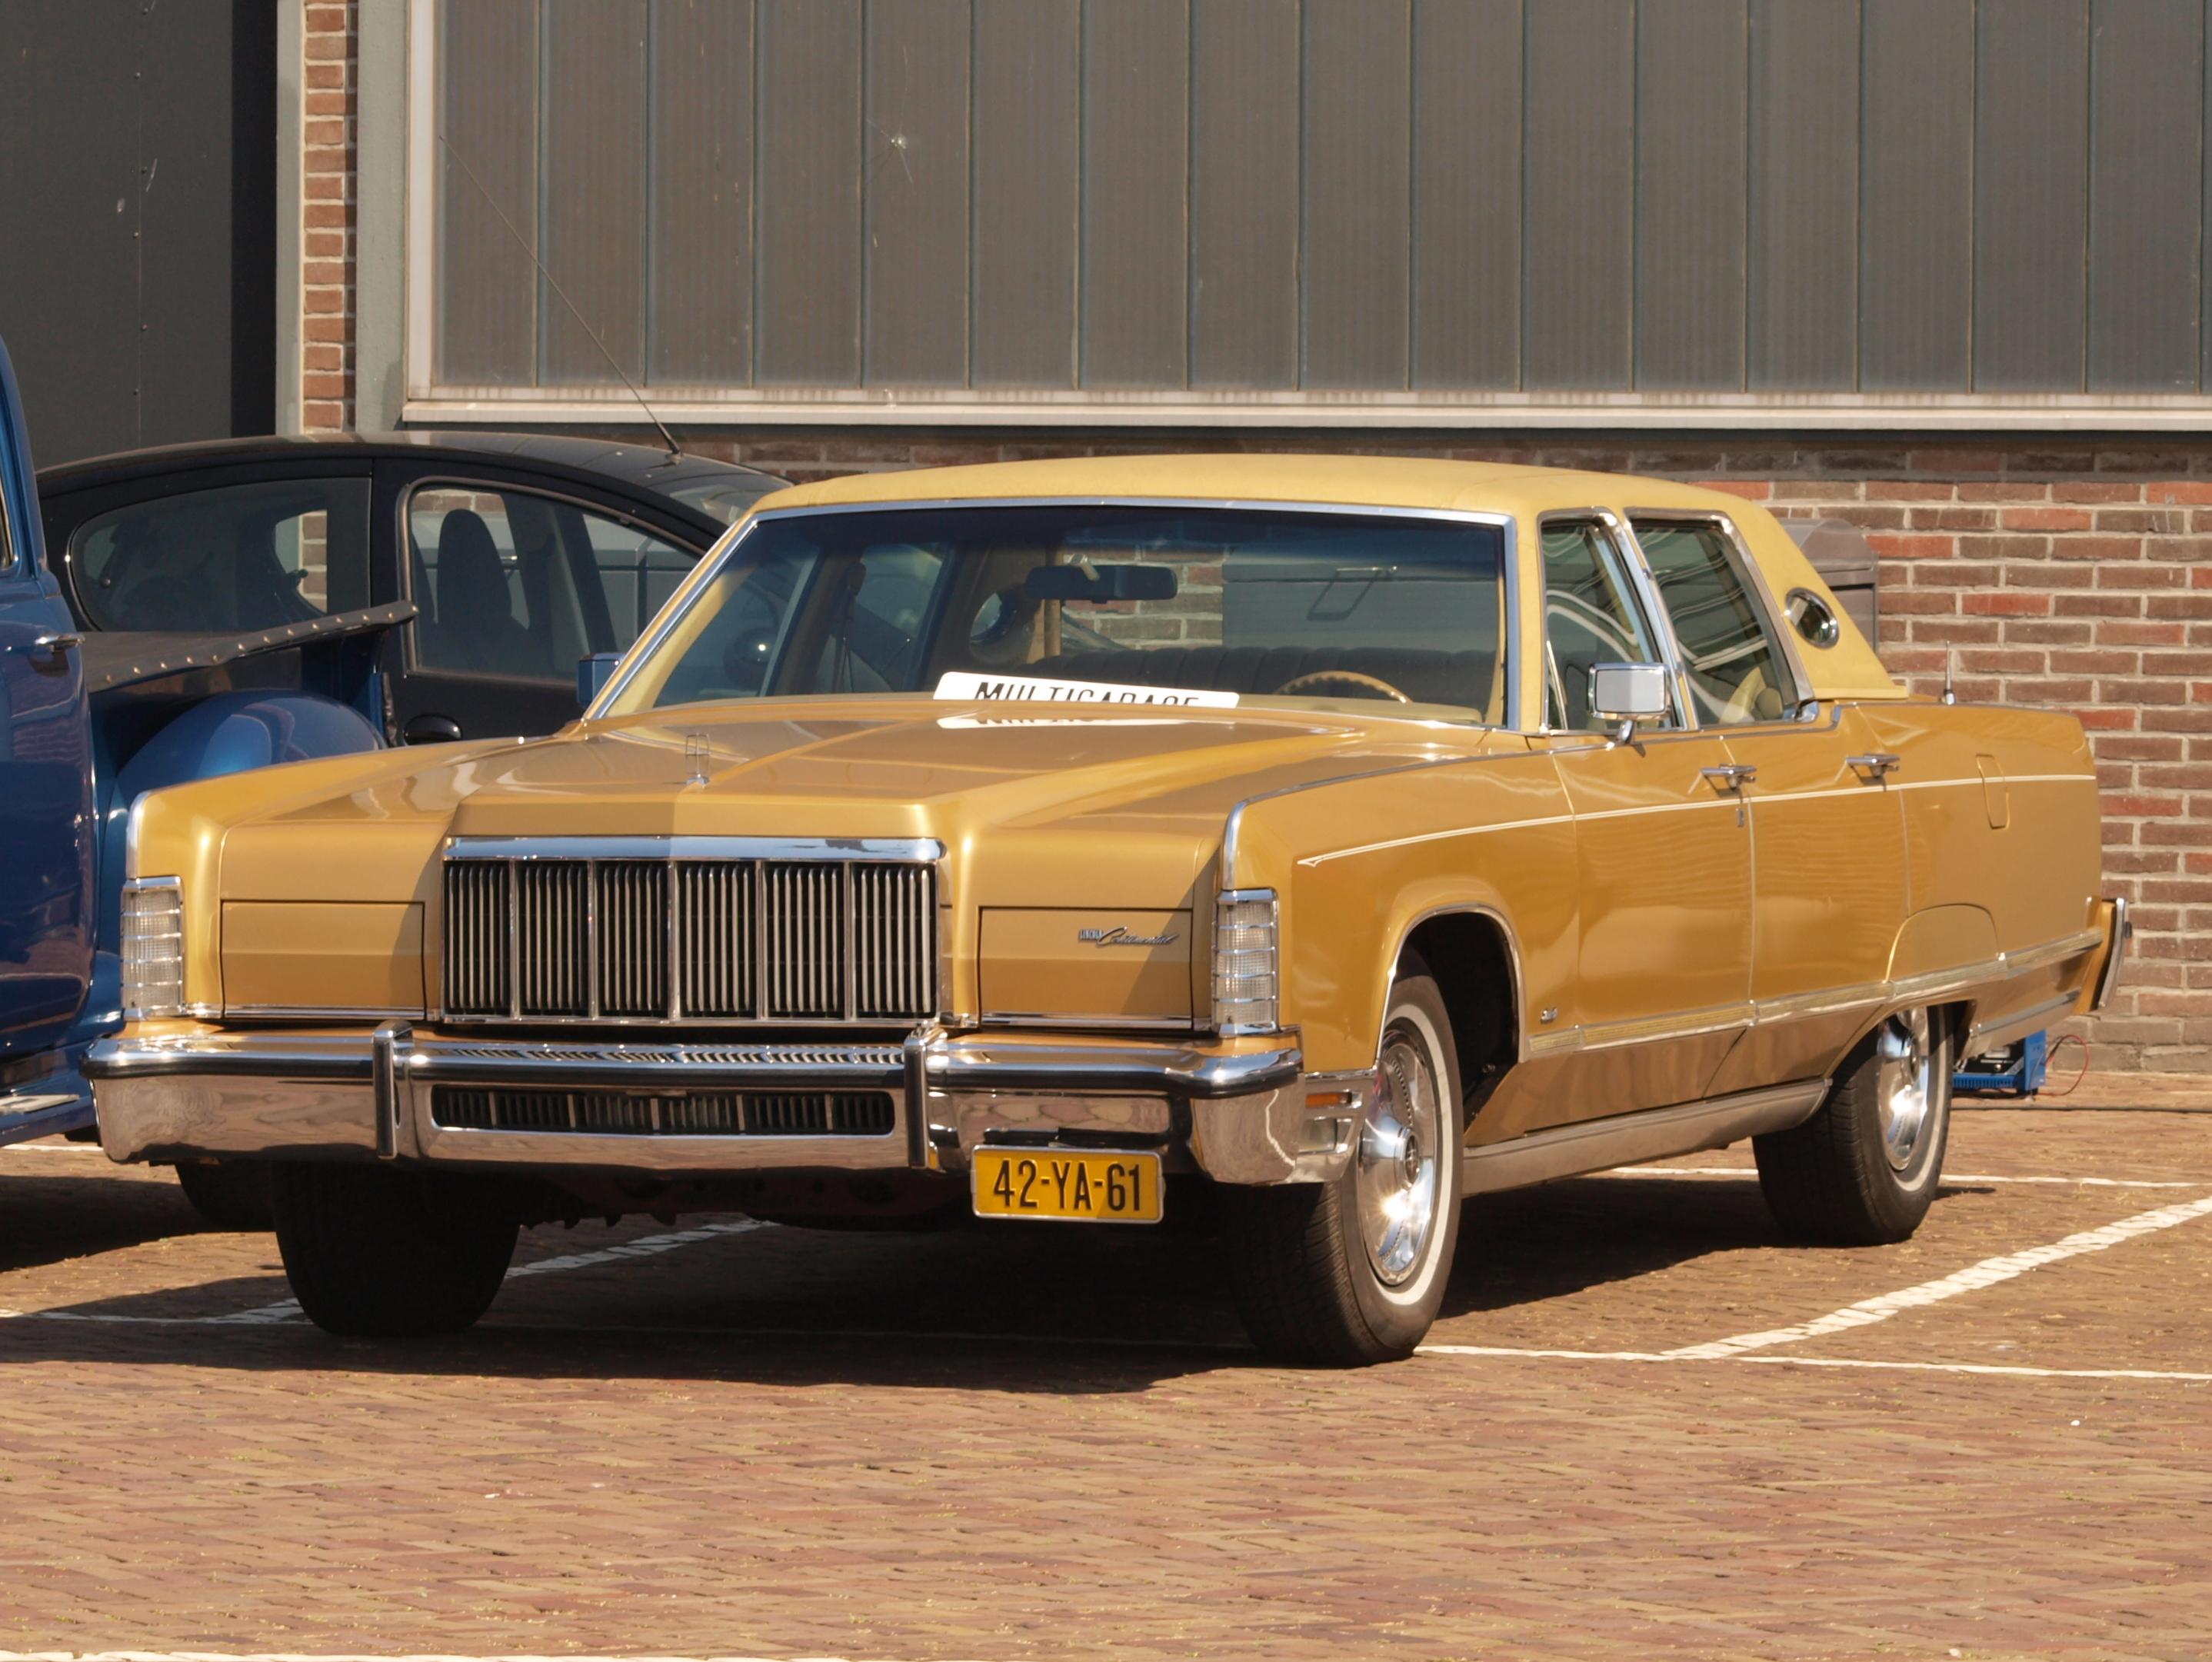 Lincoln_Continental_(1972),_Dutch_licenc